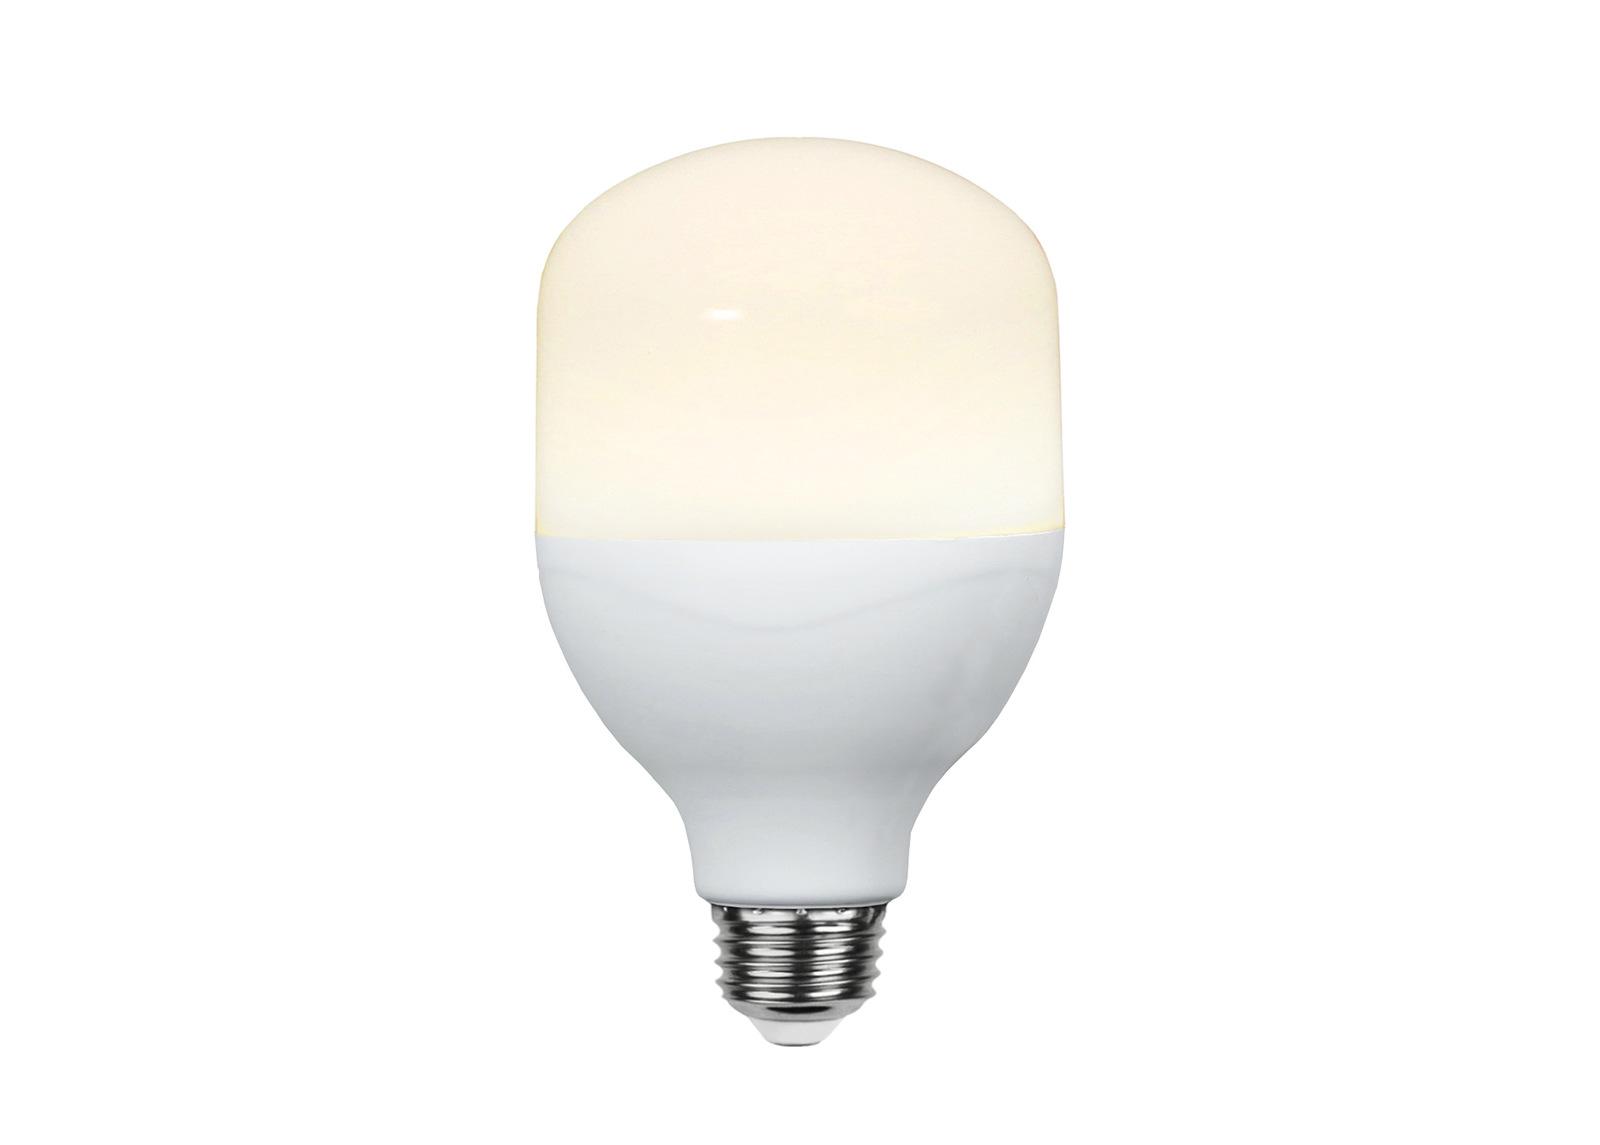 LED sähkölamppu E27 18 W